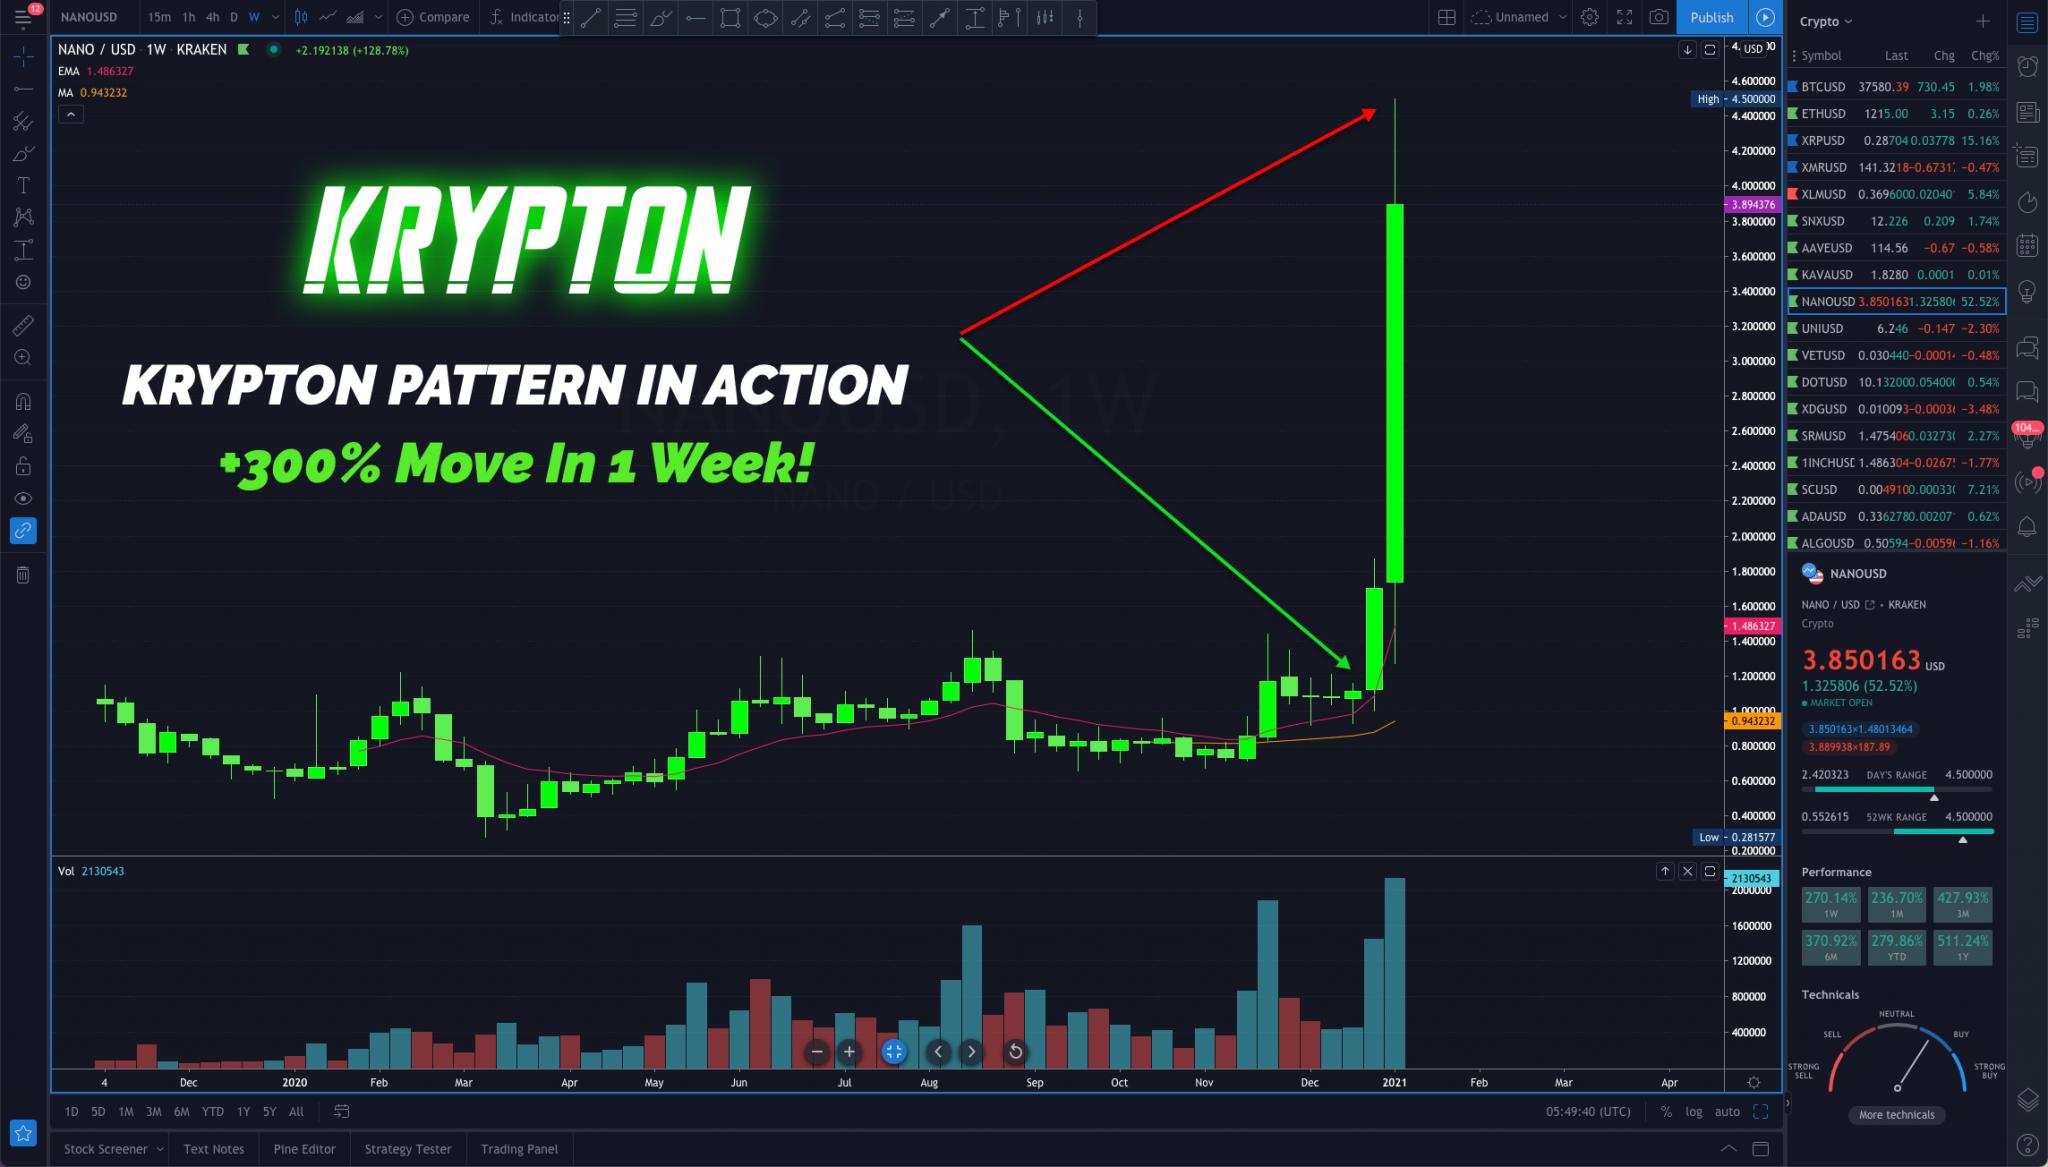 Cameron Fous – The Krypton Crypto System 2021 Free Download